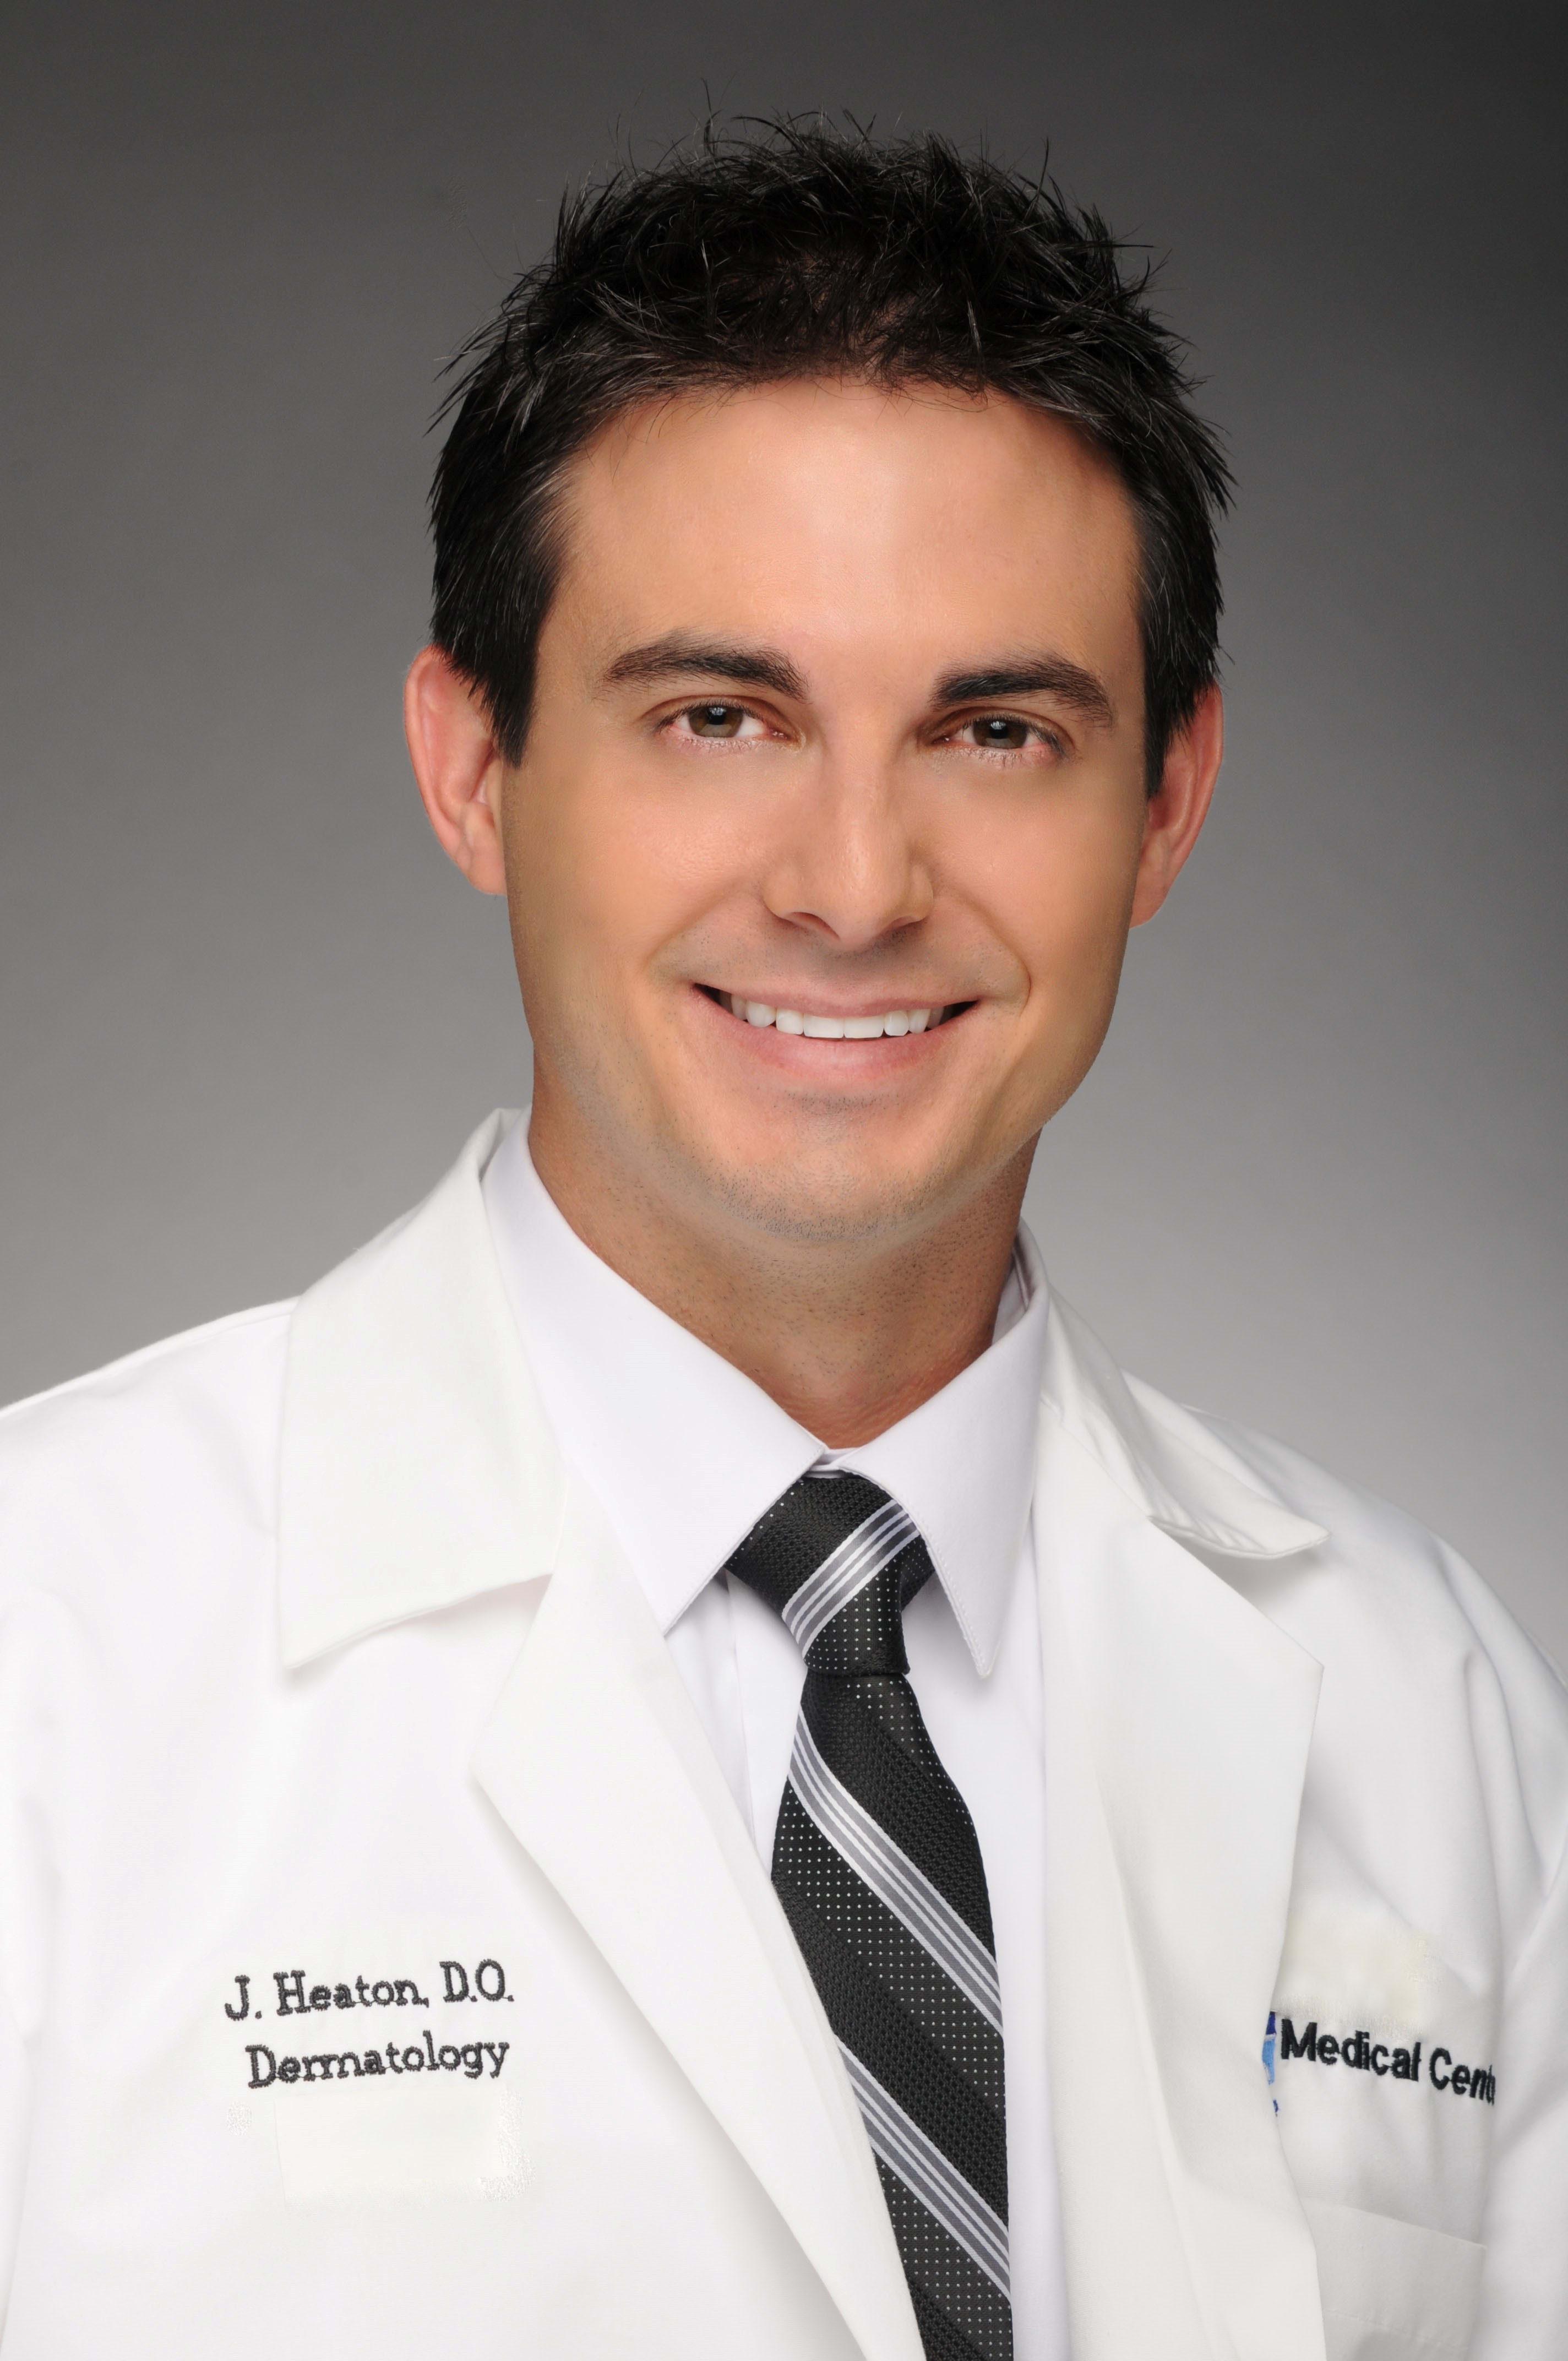 Dr. Jared R Heaton DO